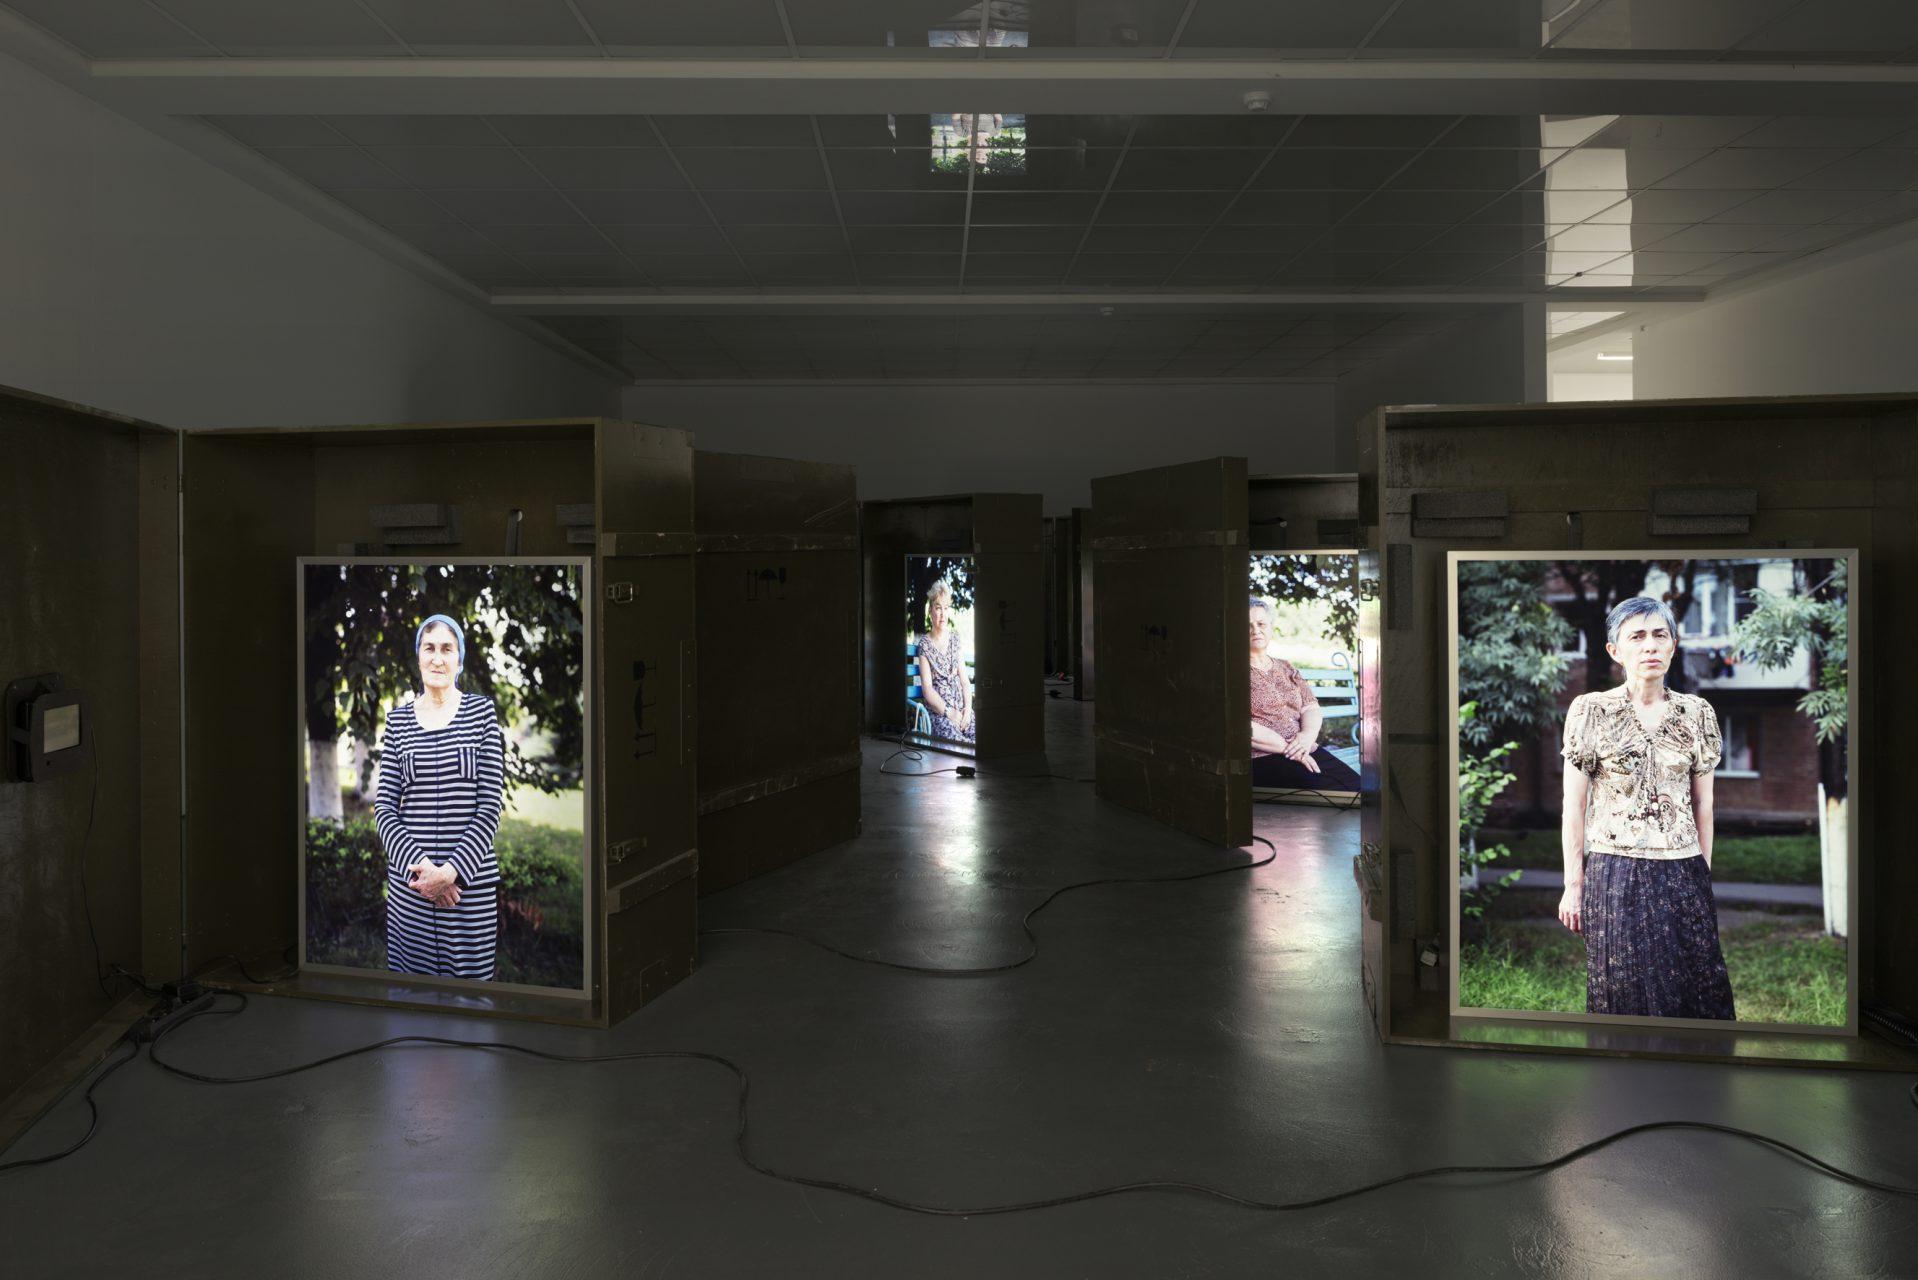 Anastasia Khoroshilova, Starie Novosti (Old News), Kunsthaus Baselland, Switzerland, 2012